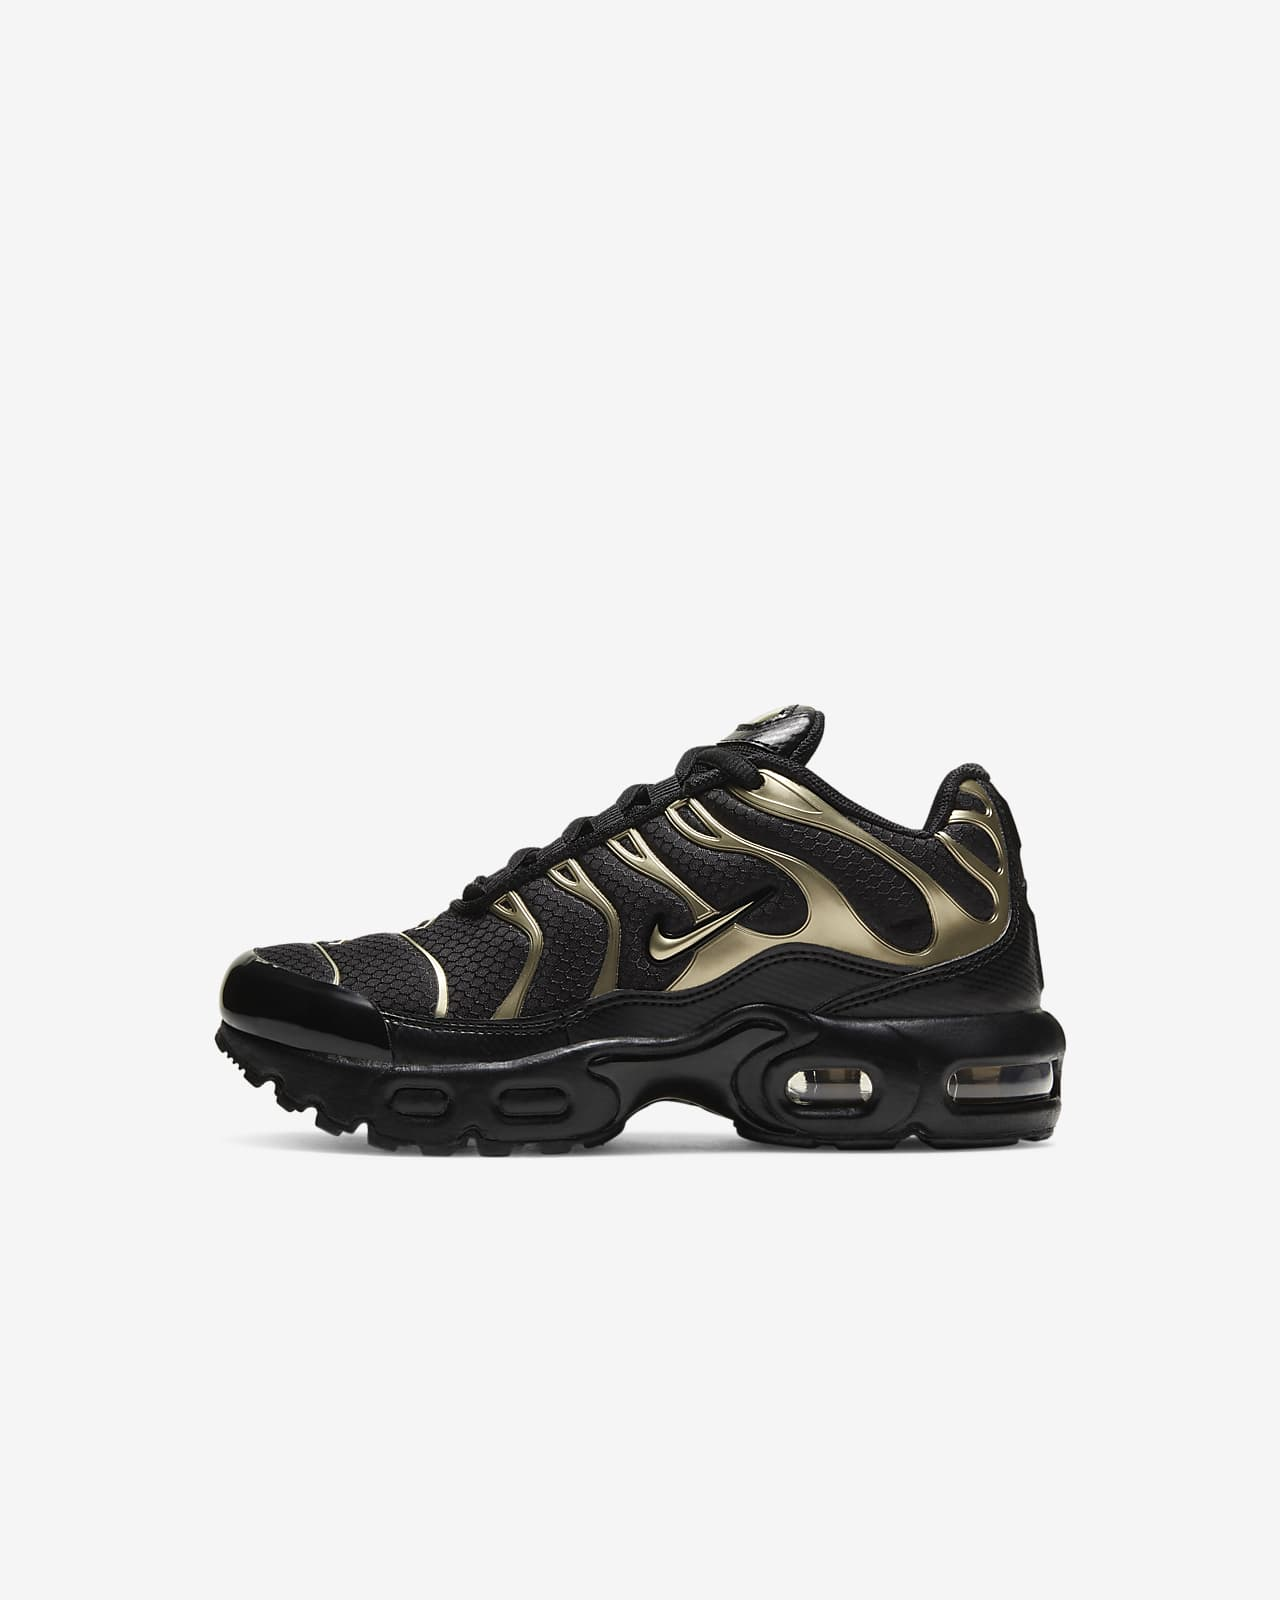 Nike Air Max Plus cipő gyerekeknek